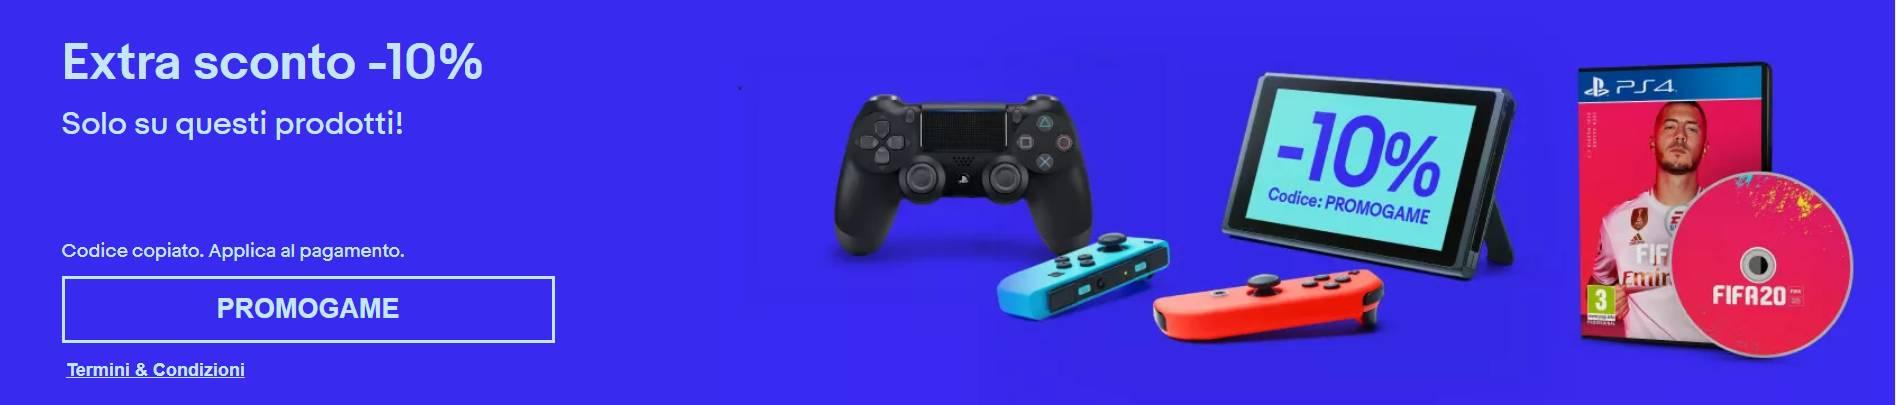 offerte gaming